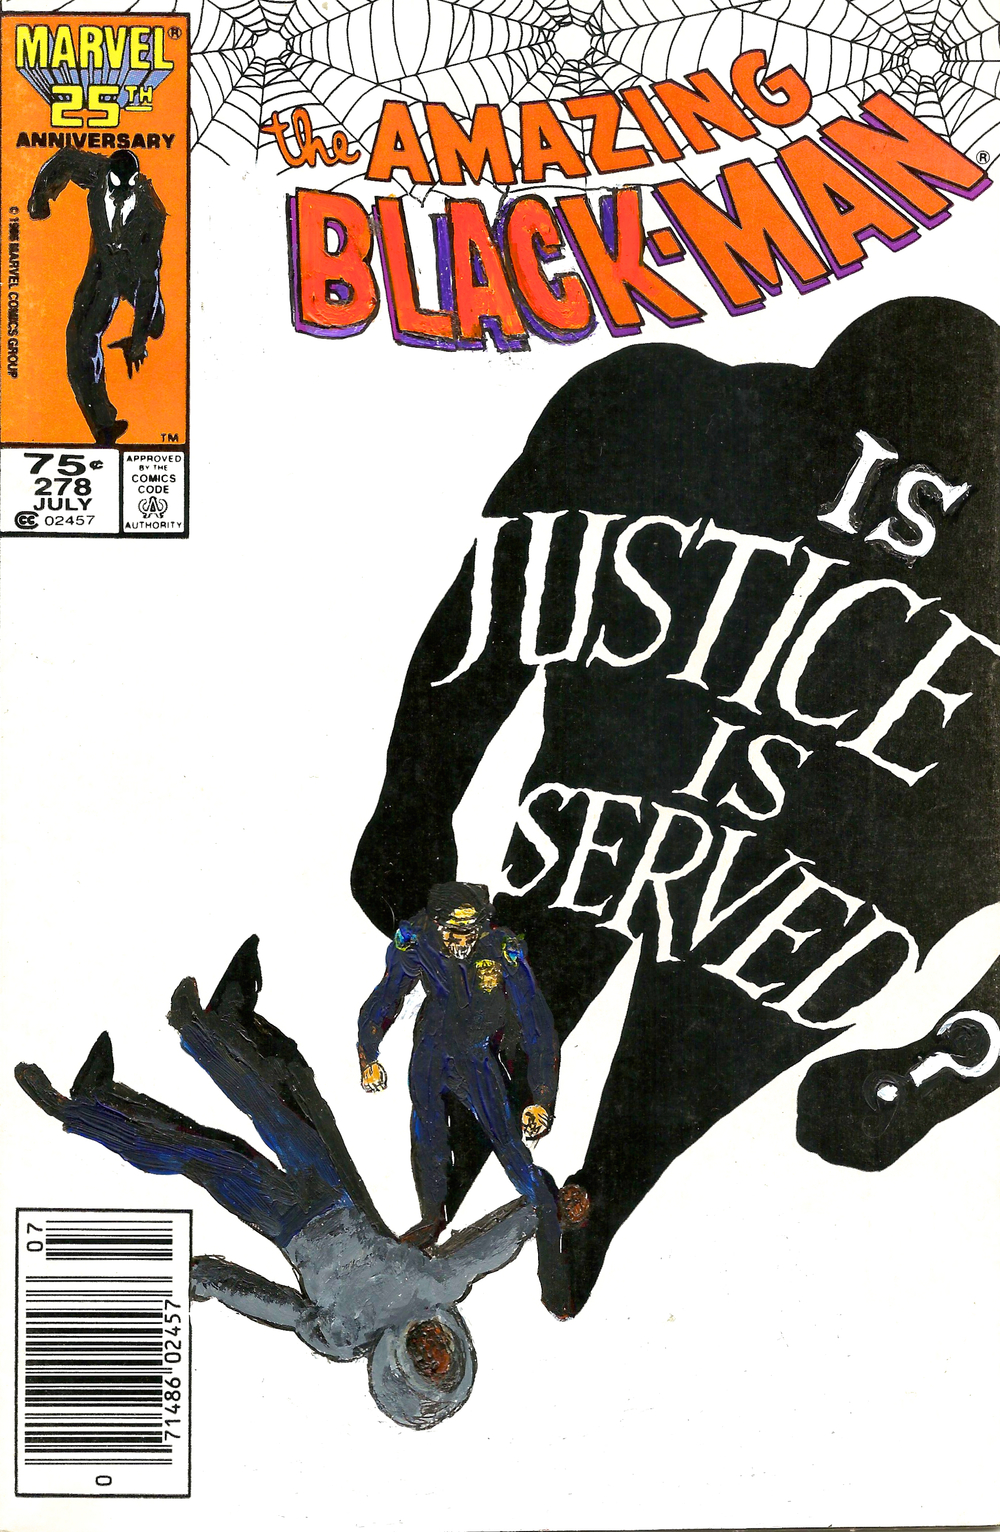 The Amazing Black-Man #278